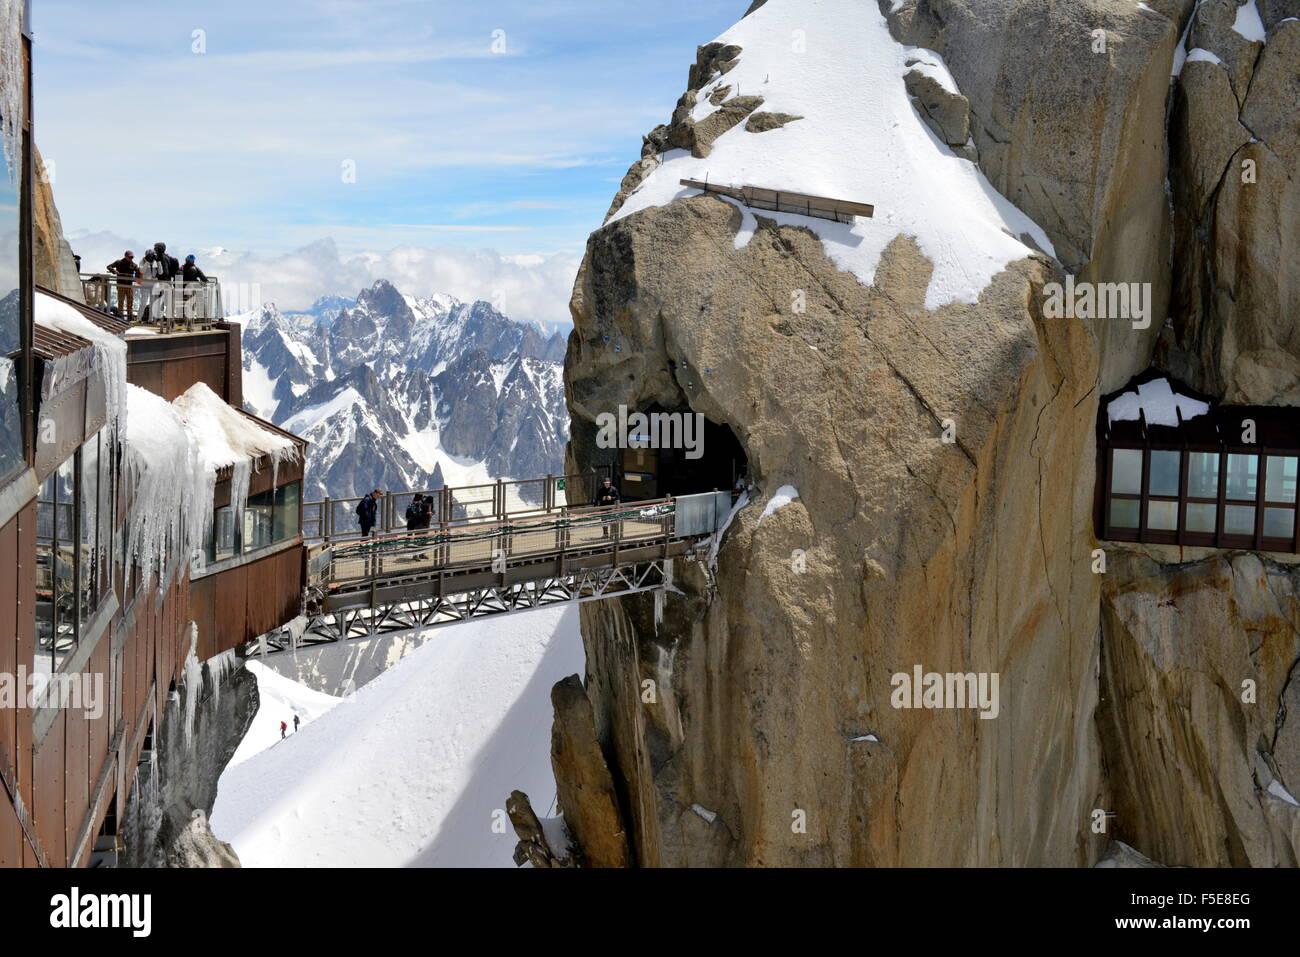 Viewing platforms and walkways, Aiguille du Midi, Mont Blanc Massif, Chamonix, Haute Savoie, French Alps, France, - Stock Image